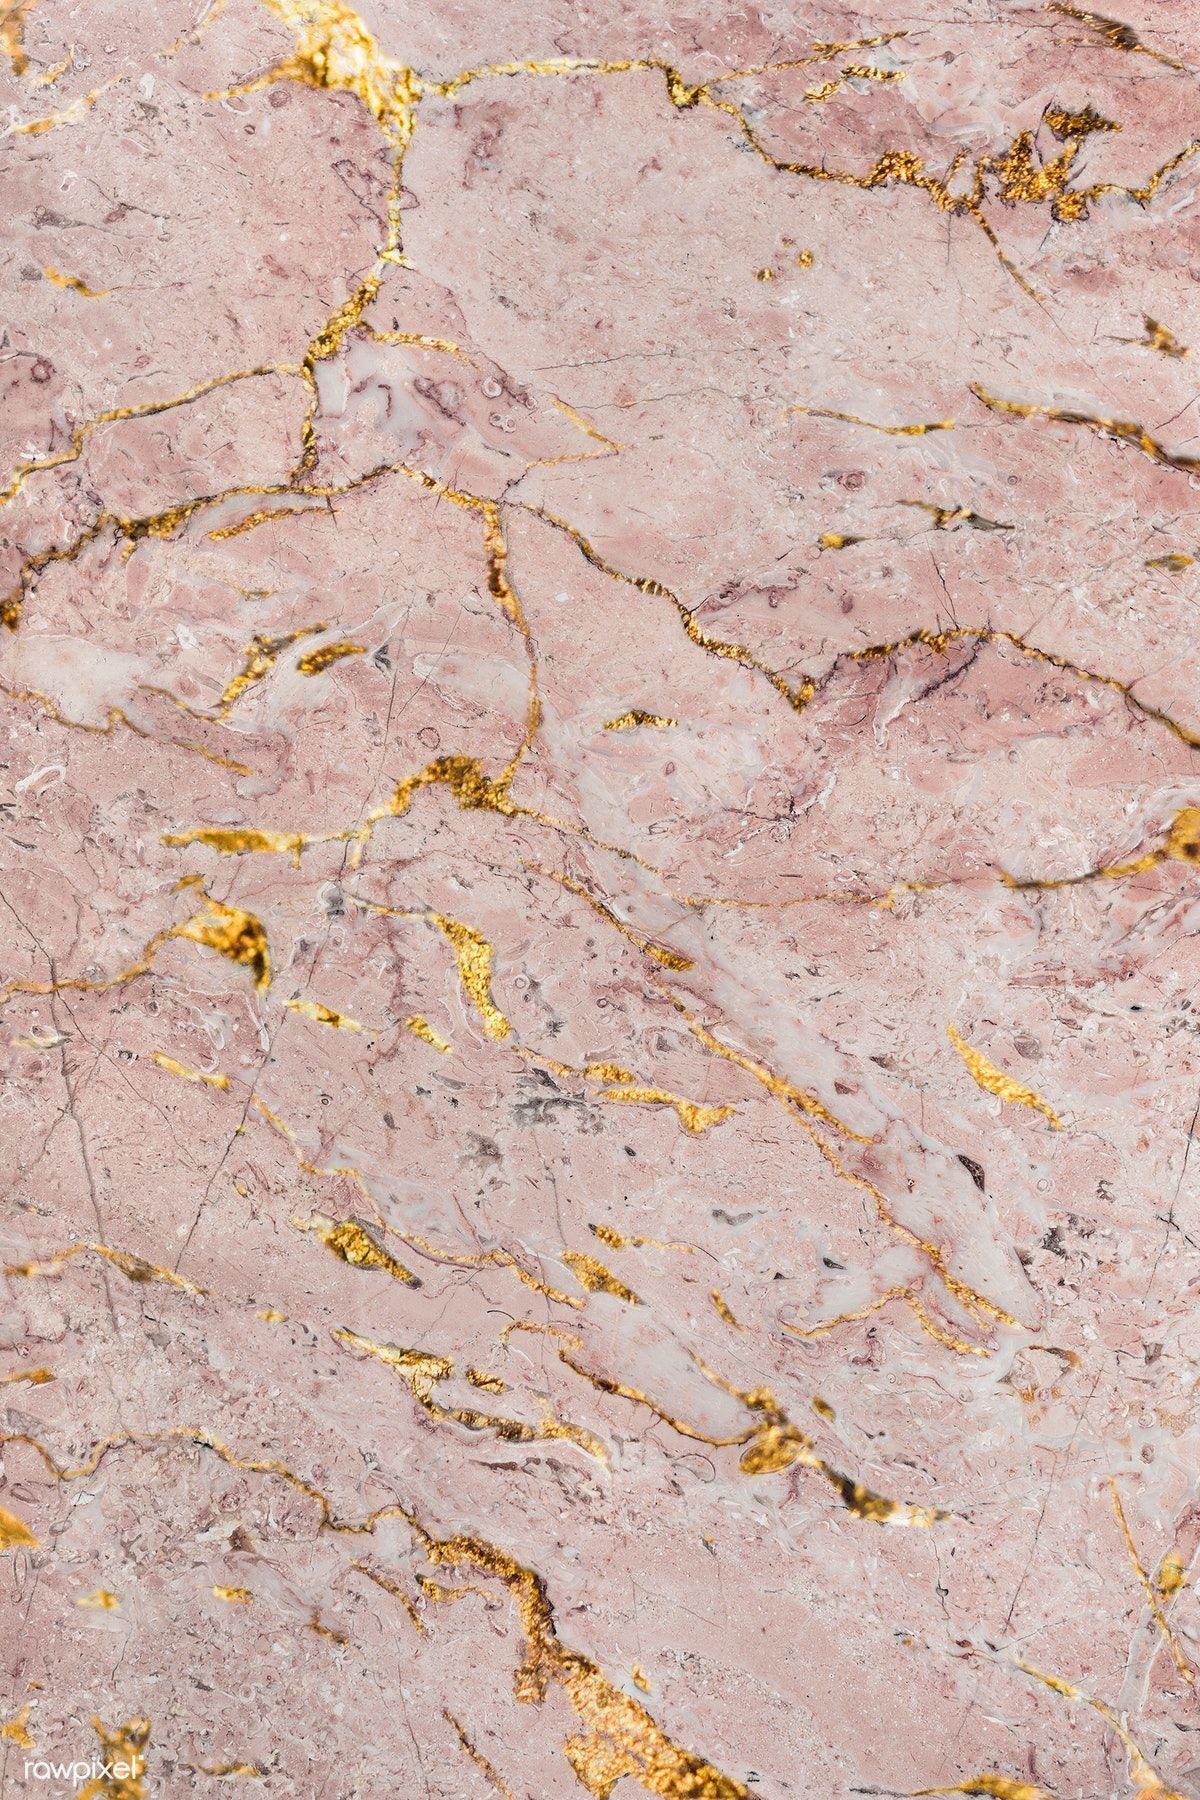 Pink marble textured mobile phone wallpaper | premium image by rawpixel.com #vector #vectoart #digitalpainting #digitalartist #garphicdesign #sketch #digitaldrawing #doodle #illustrator #digitalillustration #modernart #marble